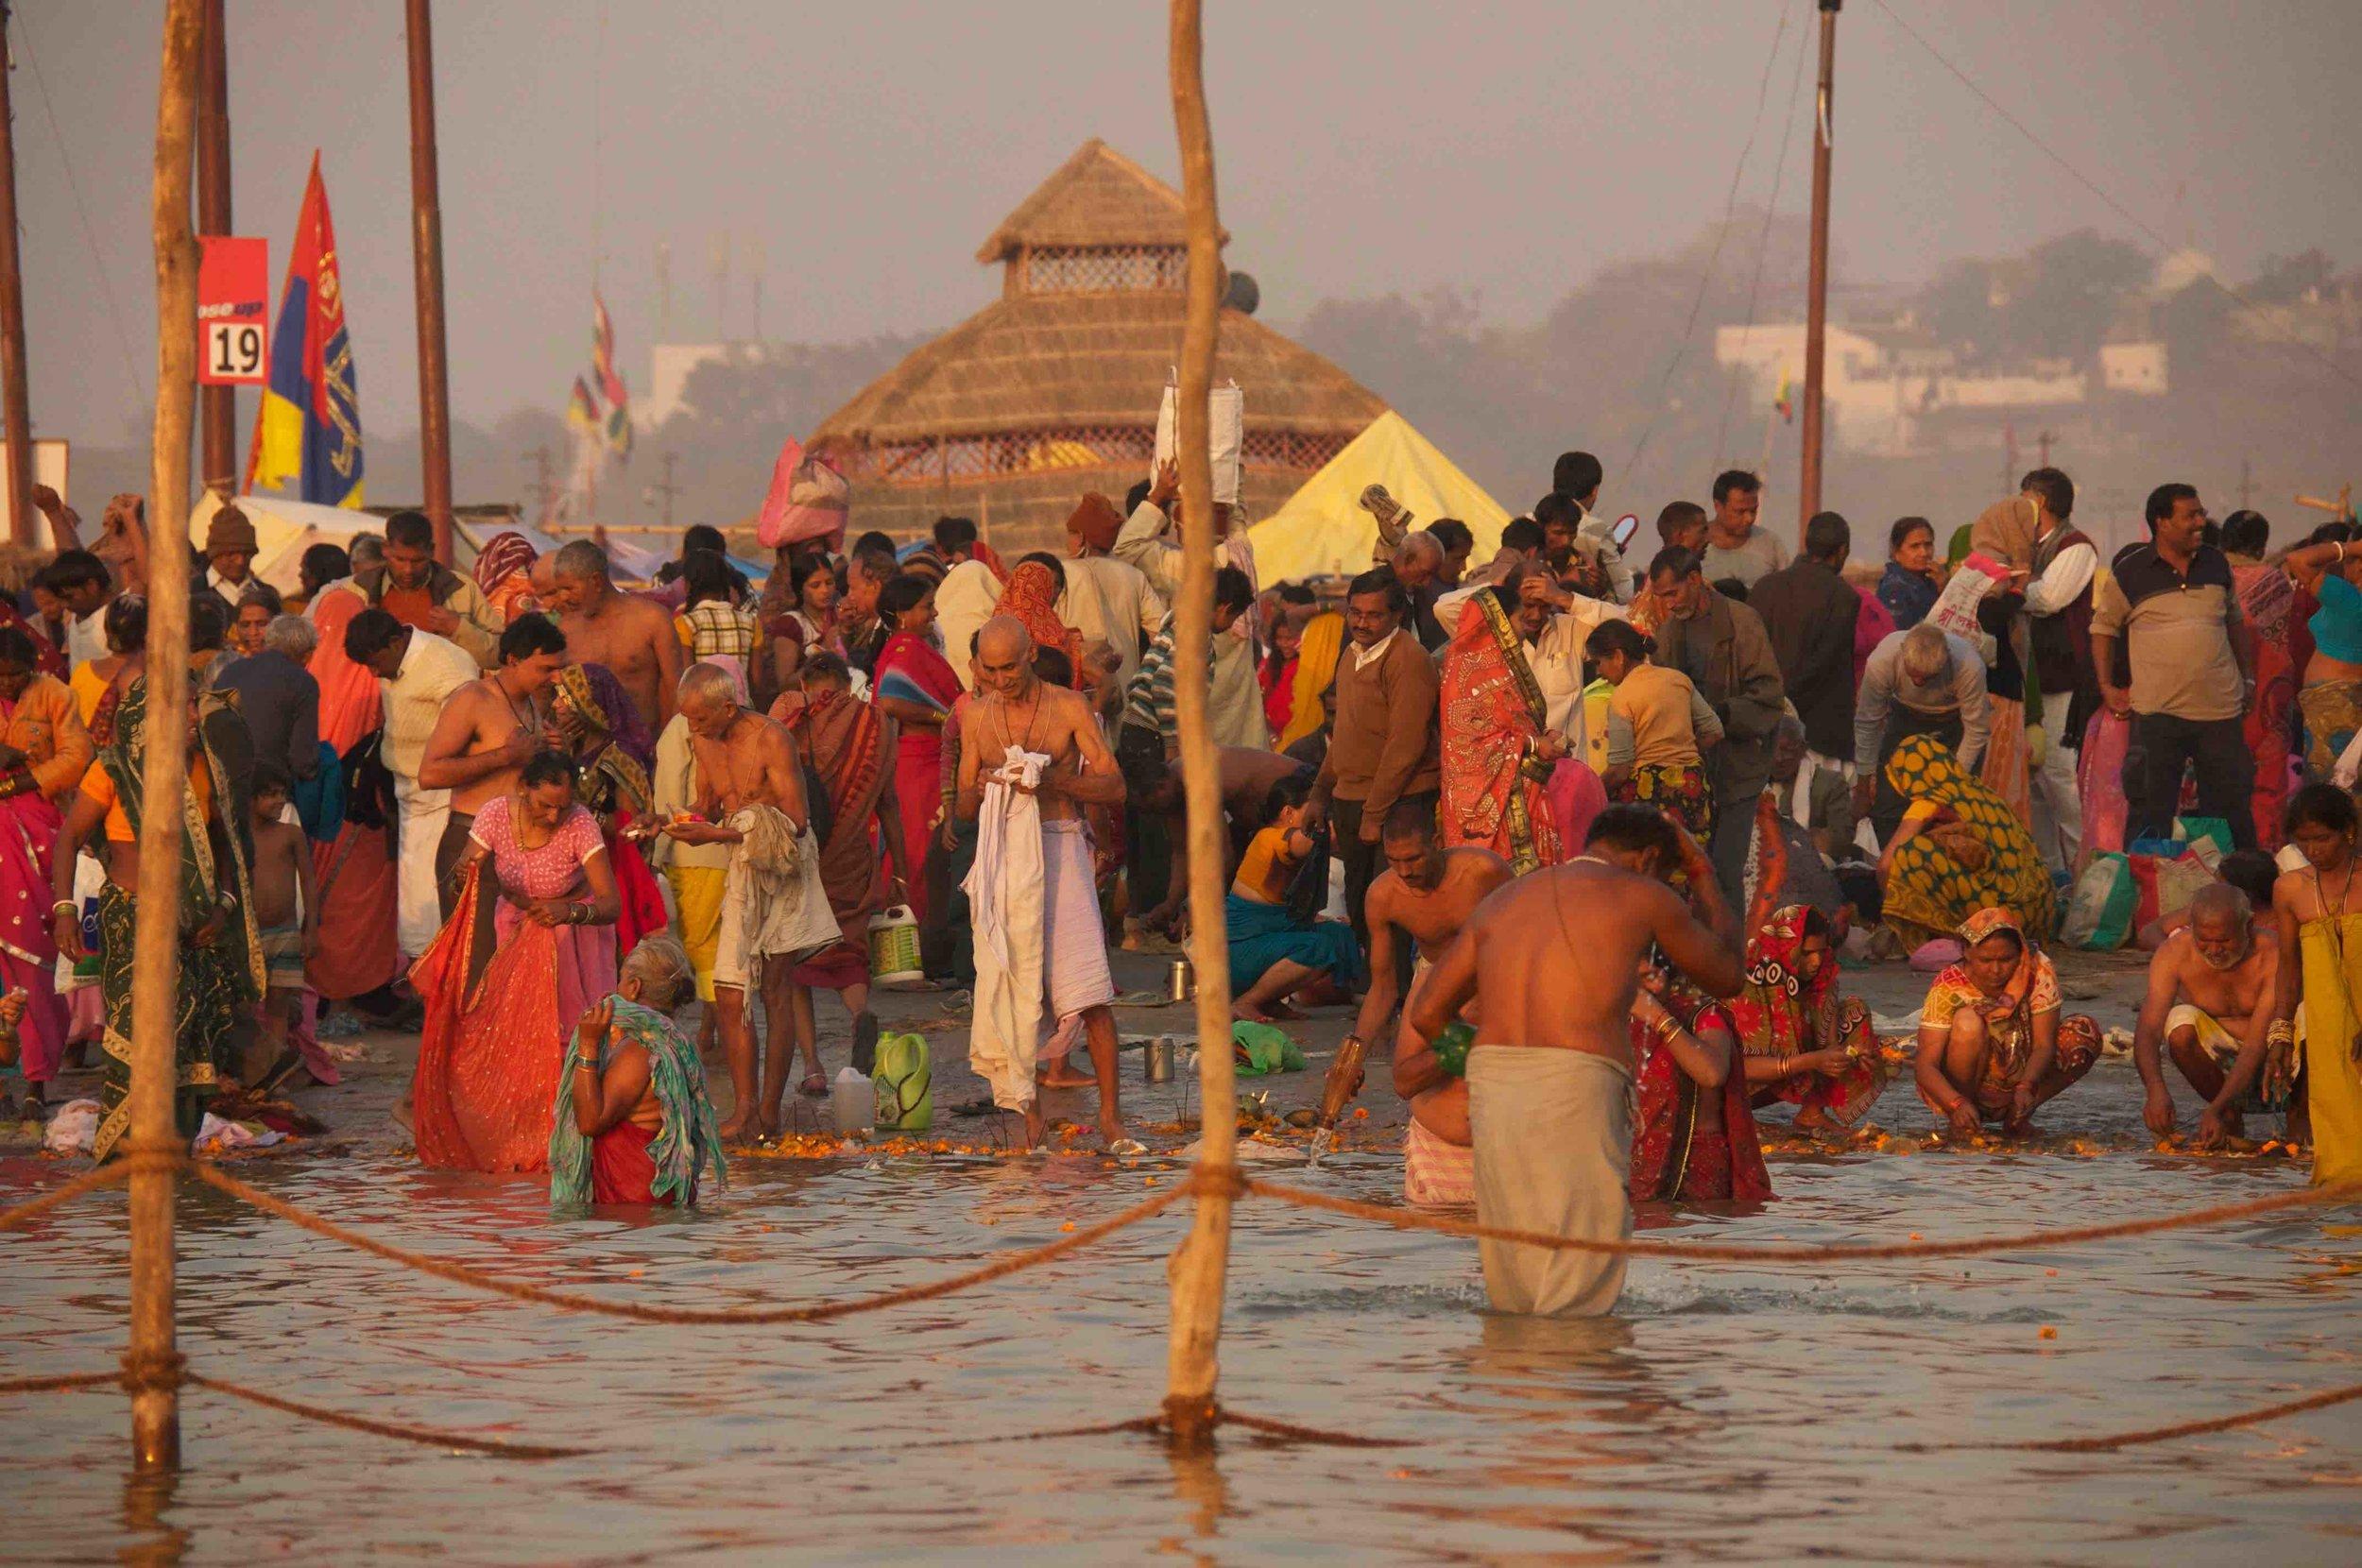 Yolanda-French-Yogalanda-Kumbh-Mela-Bathers.jpg